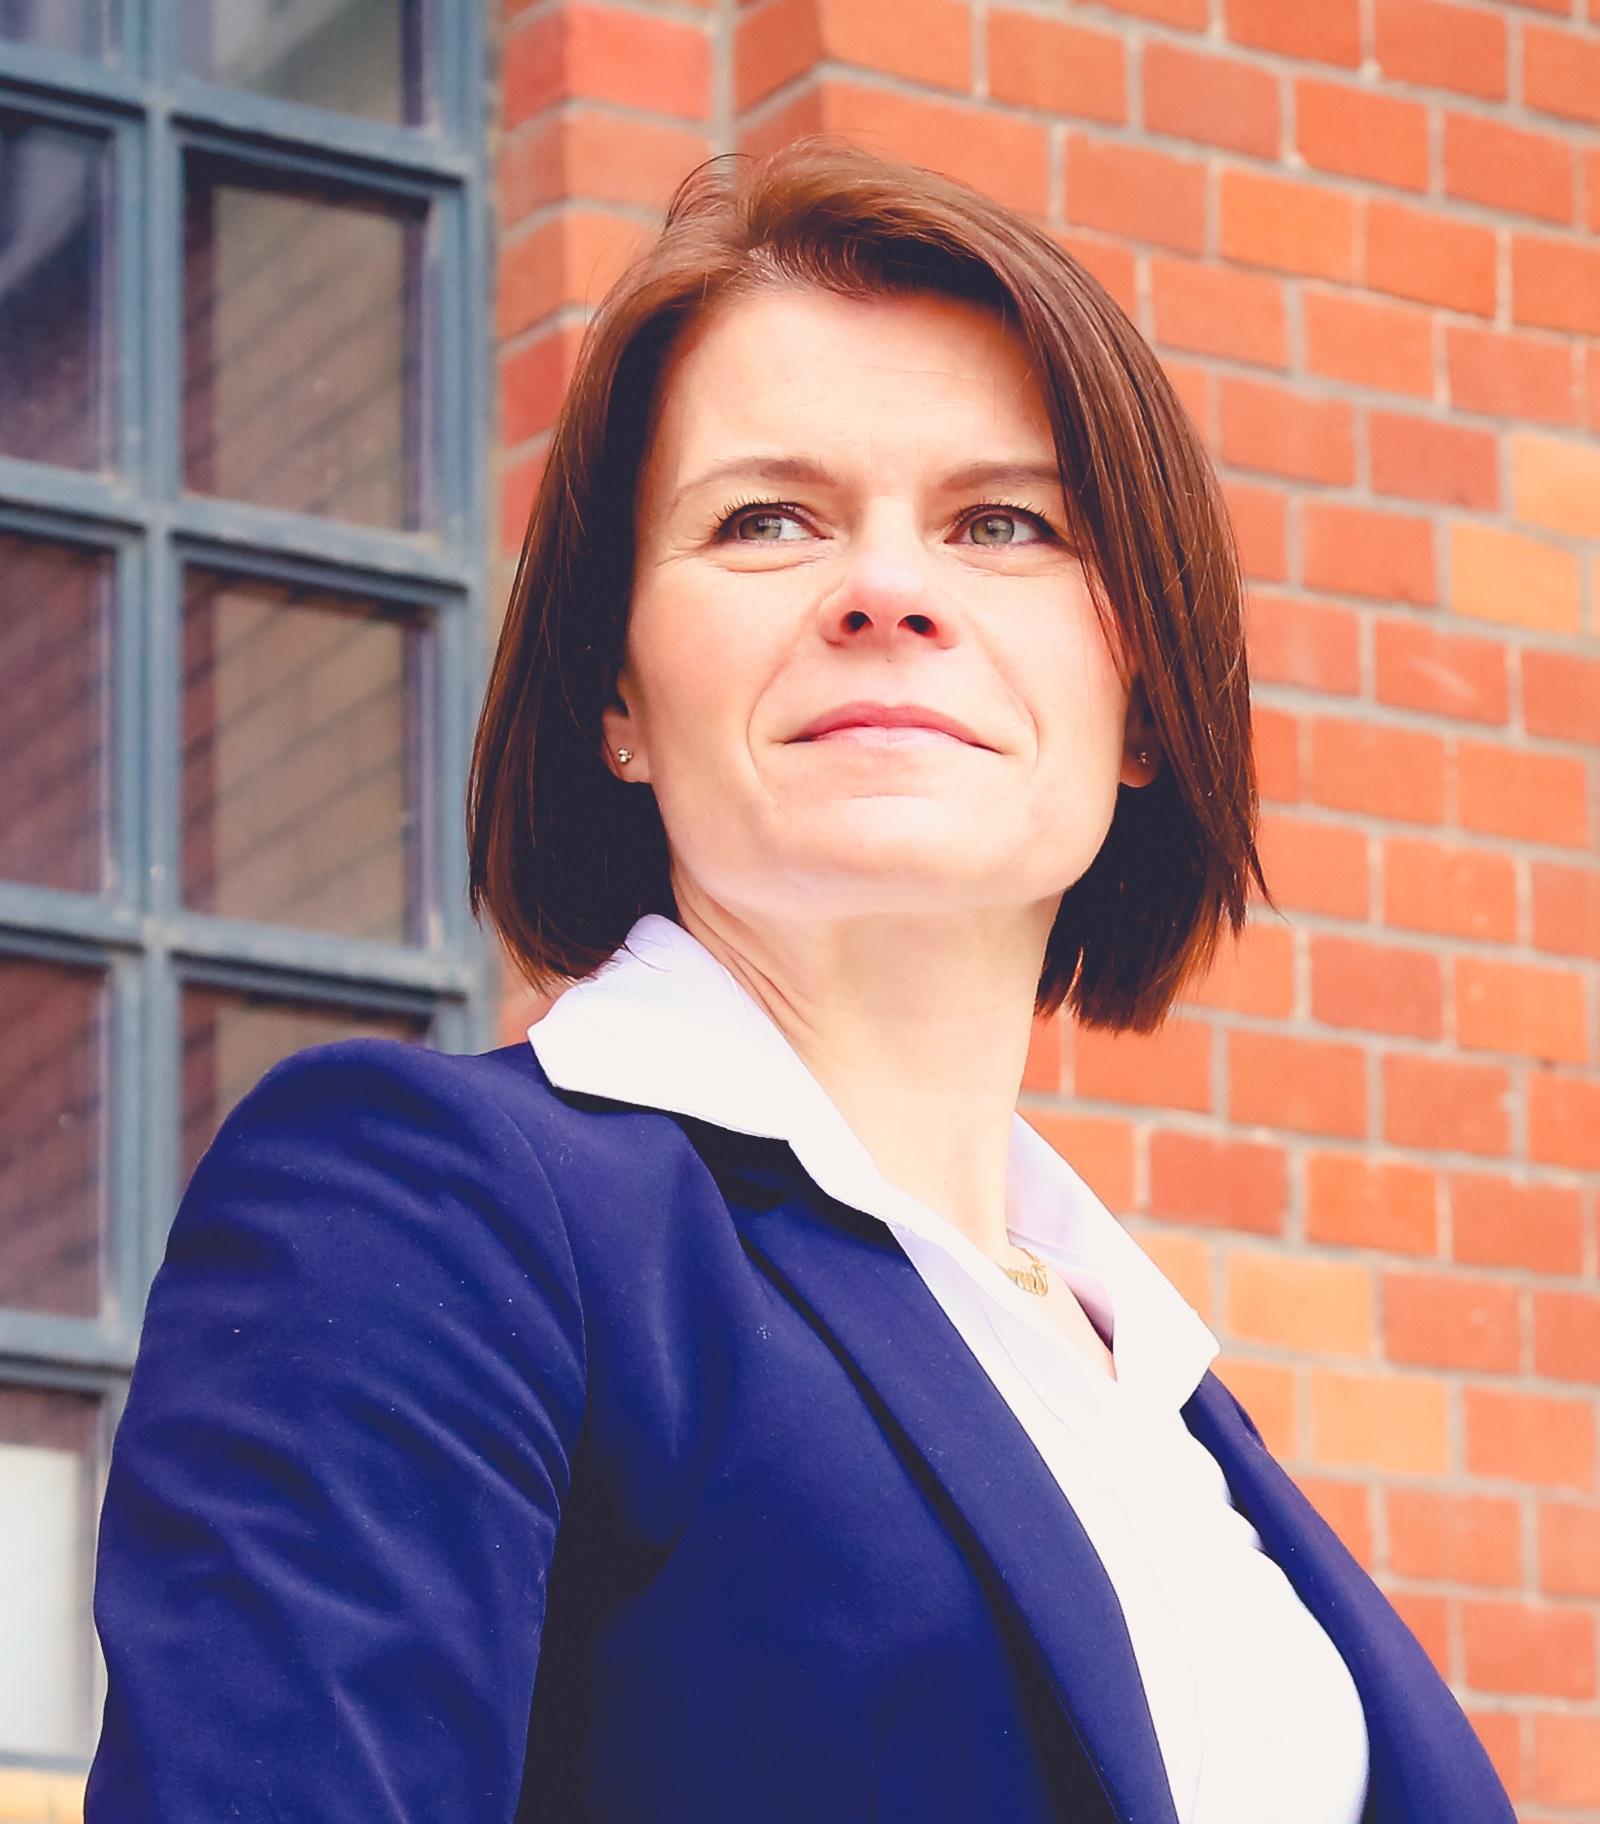 Dagmara Glowacka, Global Logistics Manager, Kongsberg Automotive